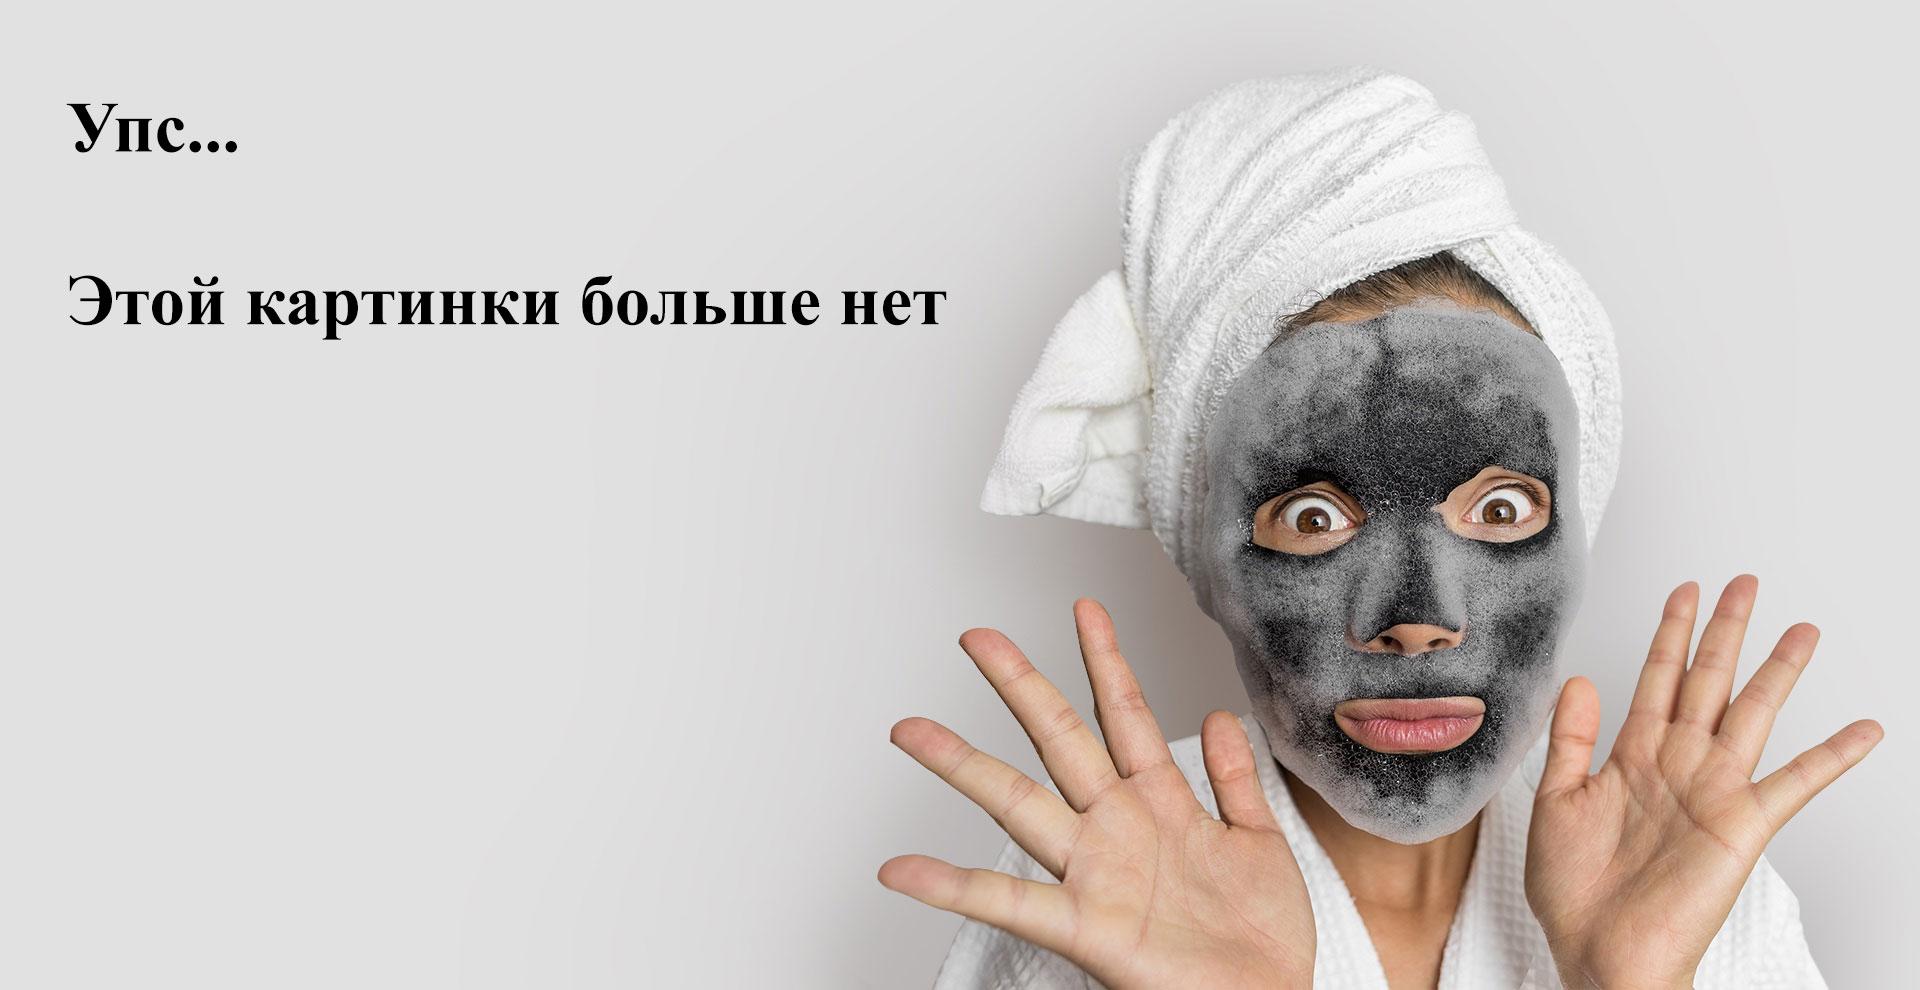 Rosi, Каучуковая база Master, 10 мл